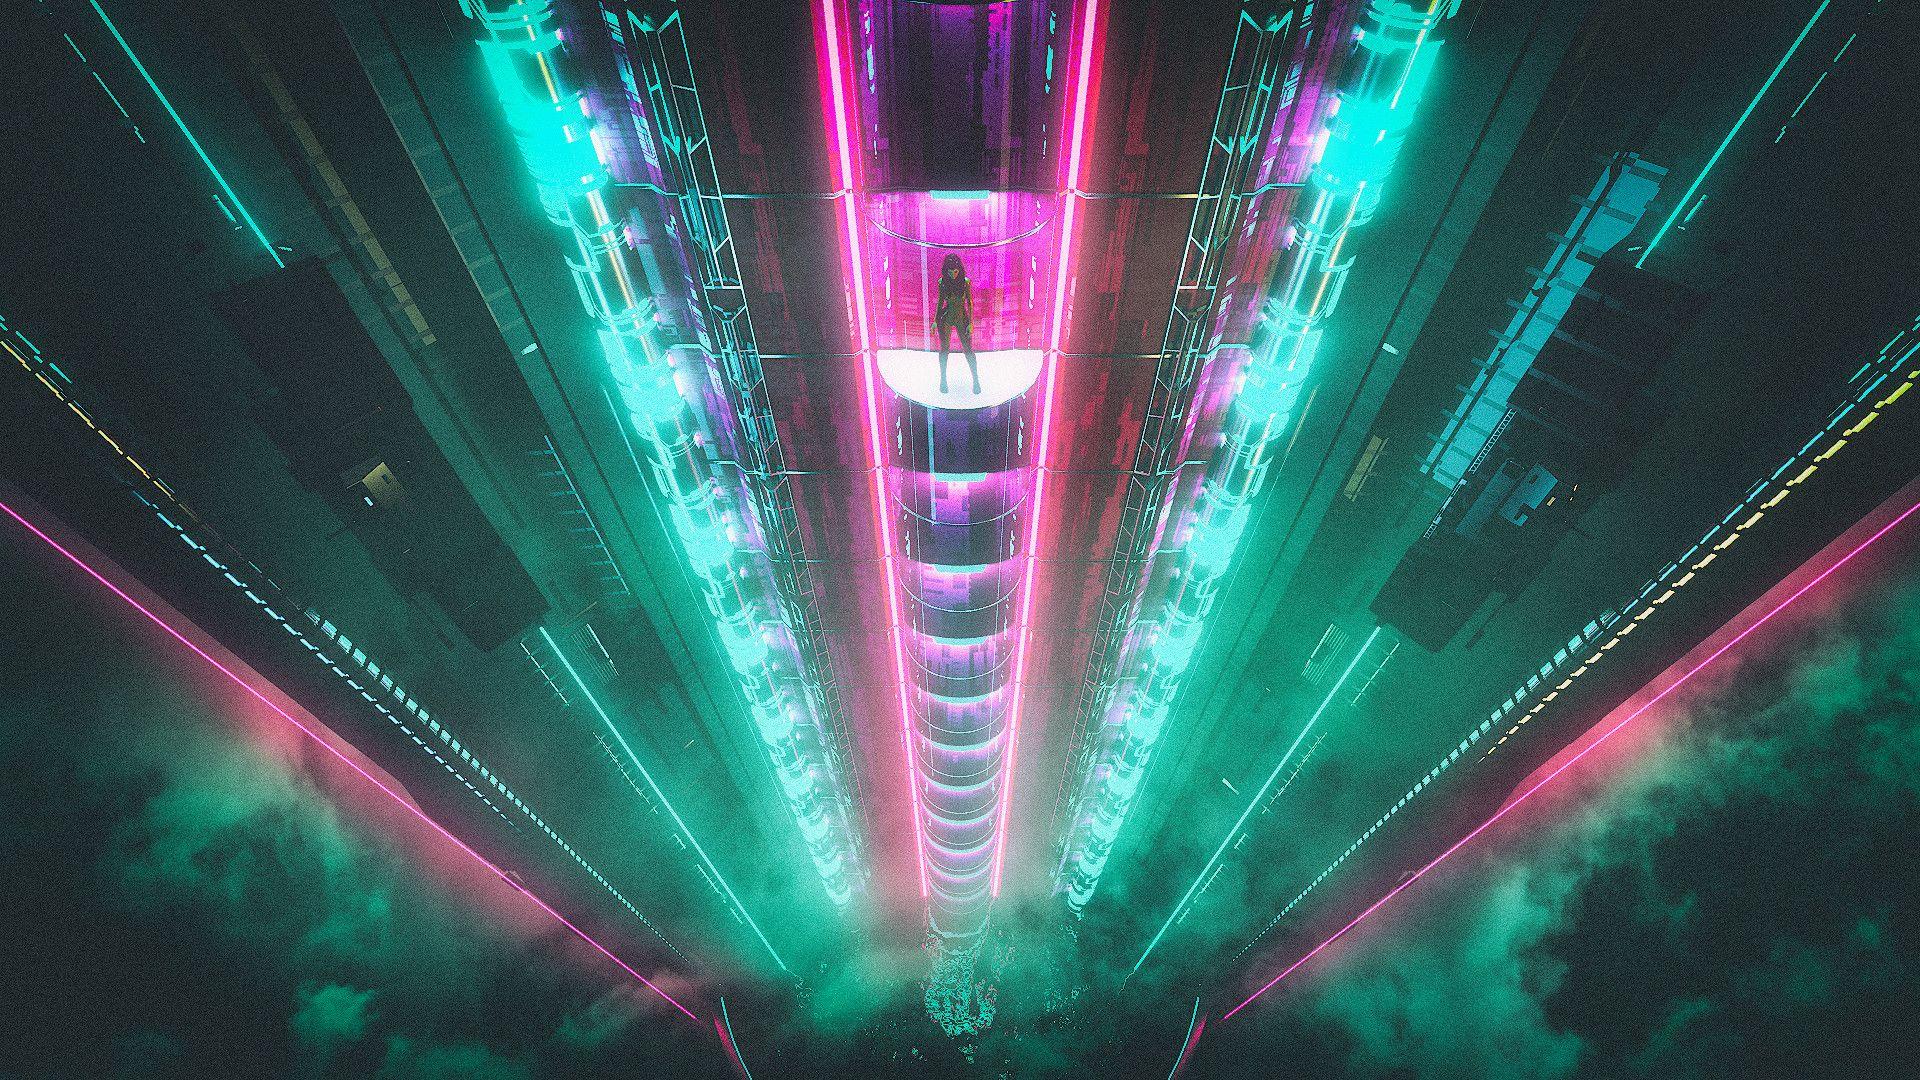 Cyberpunk Elevation by David Legnon [1920x1080